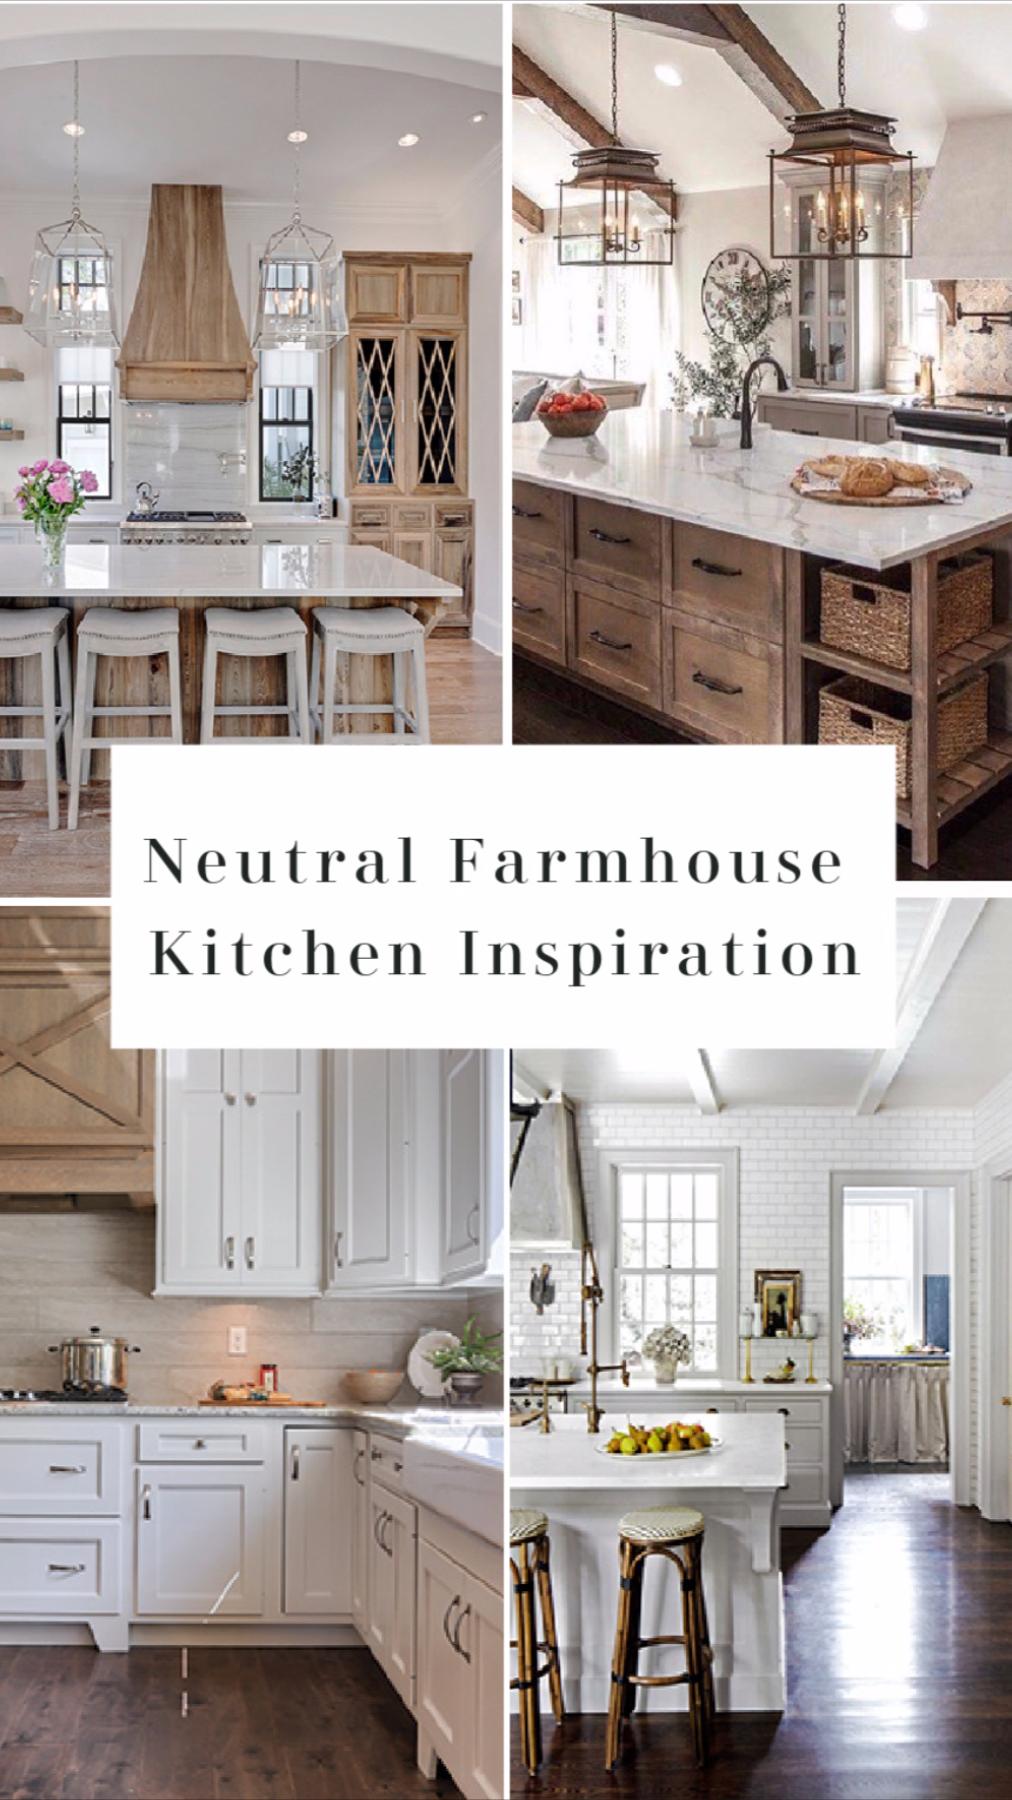 Neutral Farmhouse Kitchen Inspiration